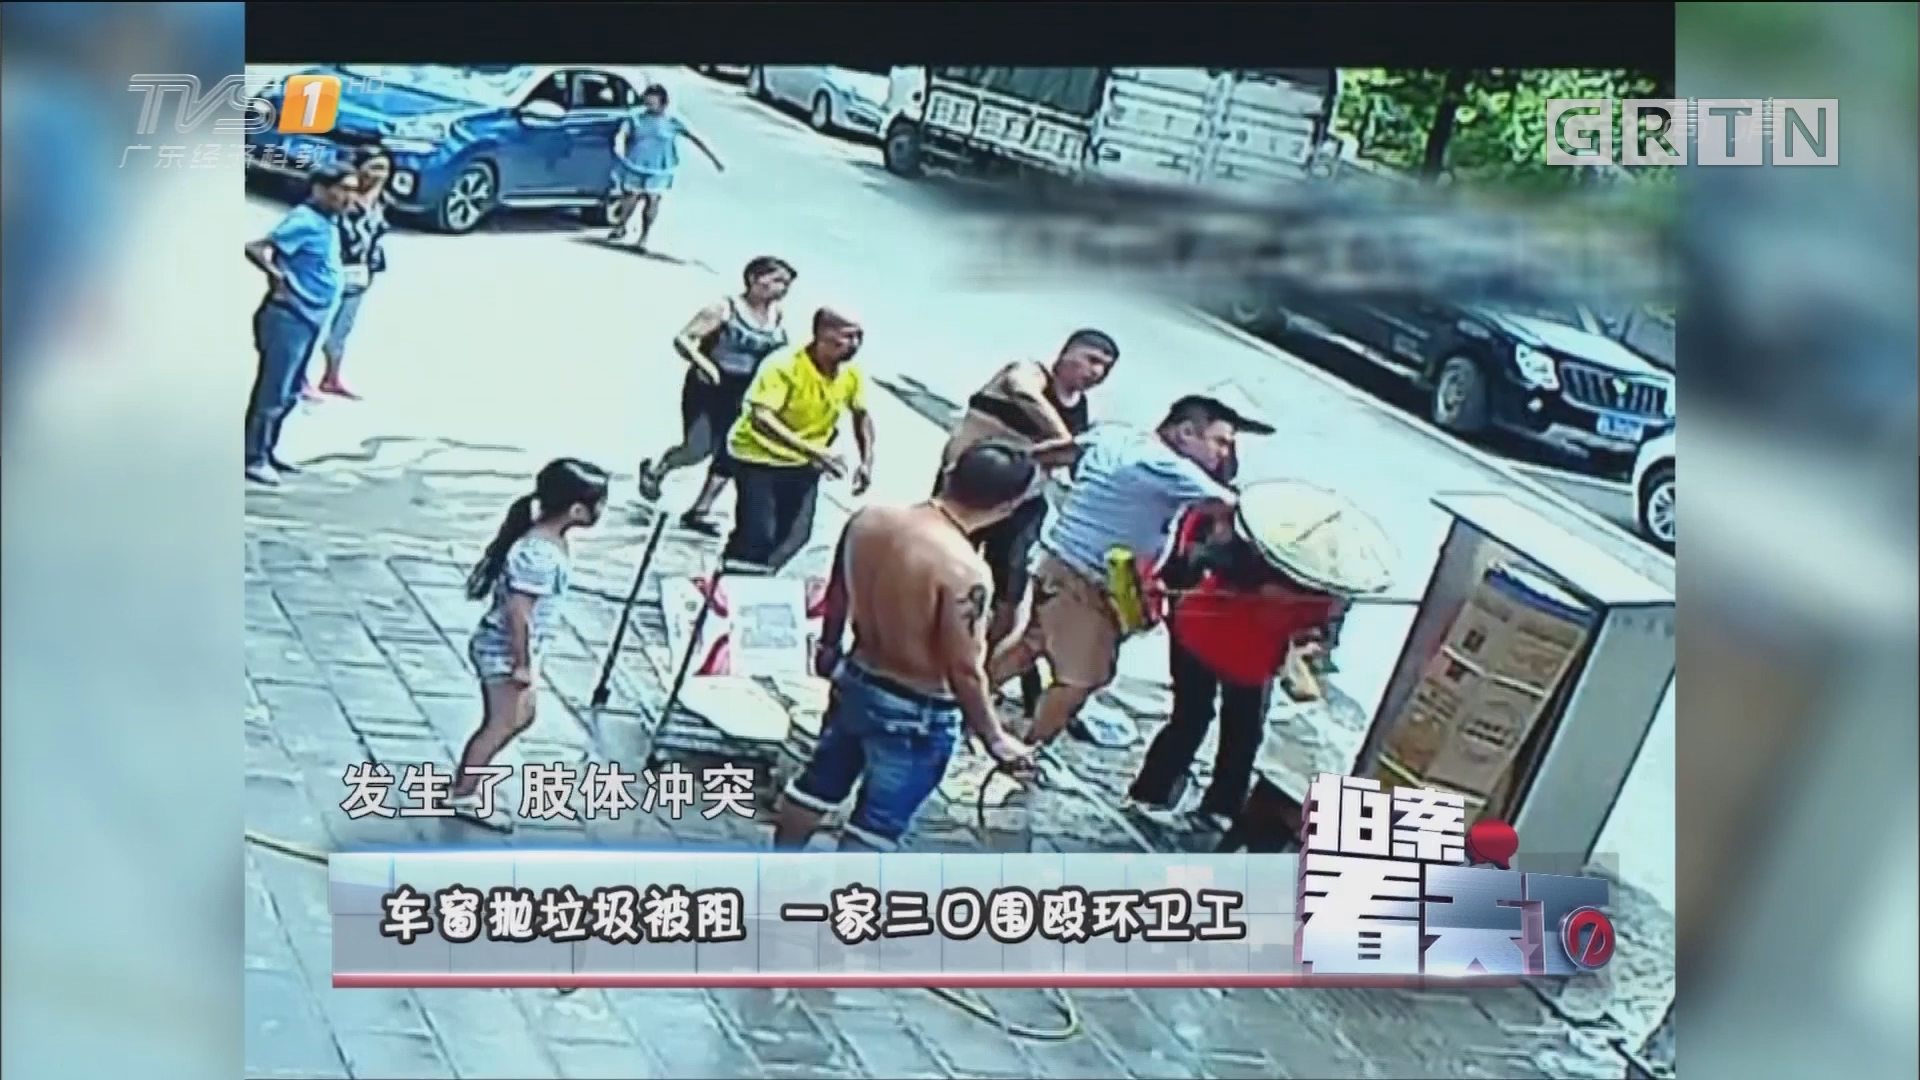 [HD][2017-07-17]拍案看天下:车窗抛垃圾被阻 一家三口围殴环卫工